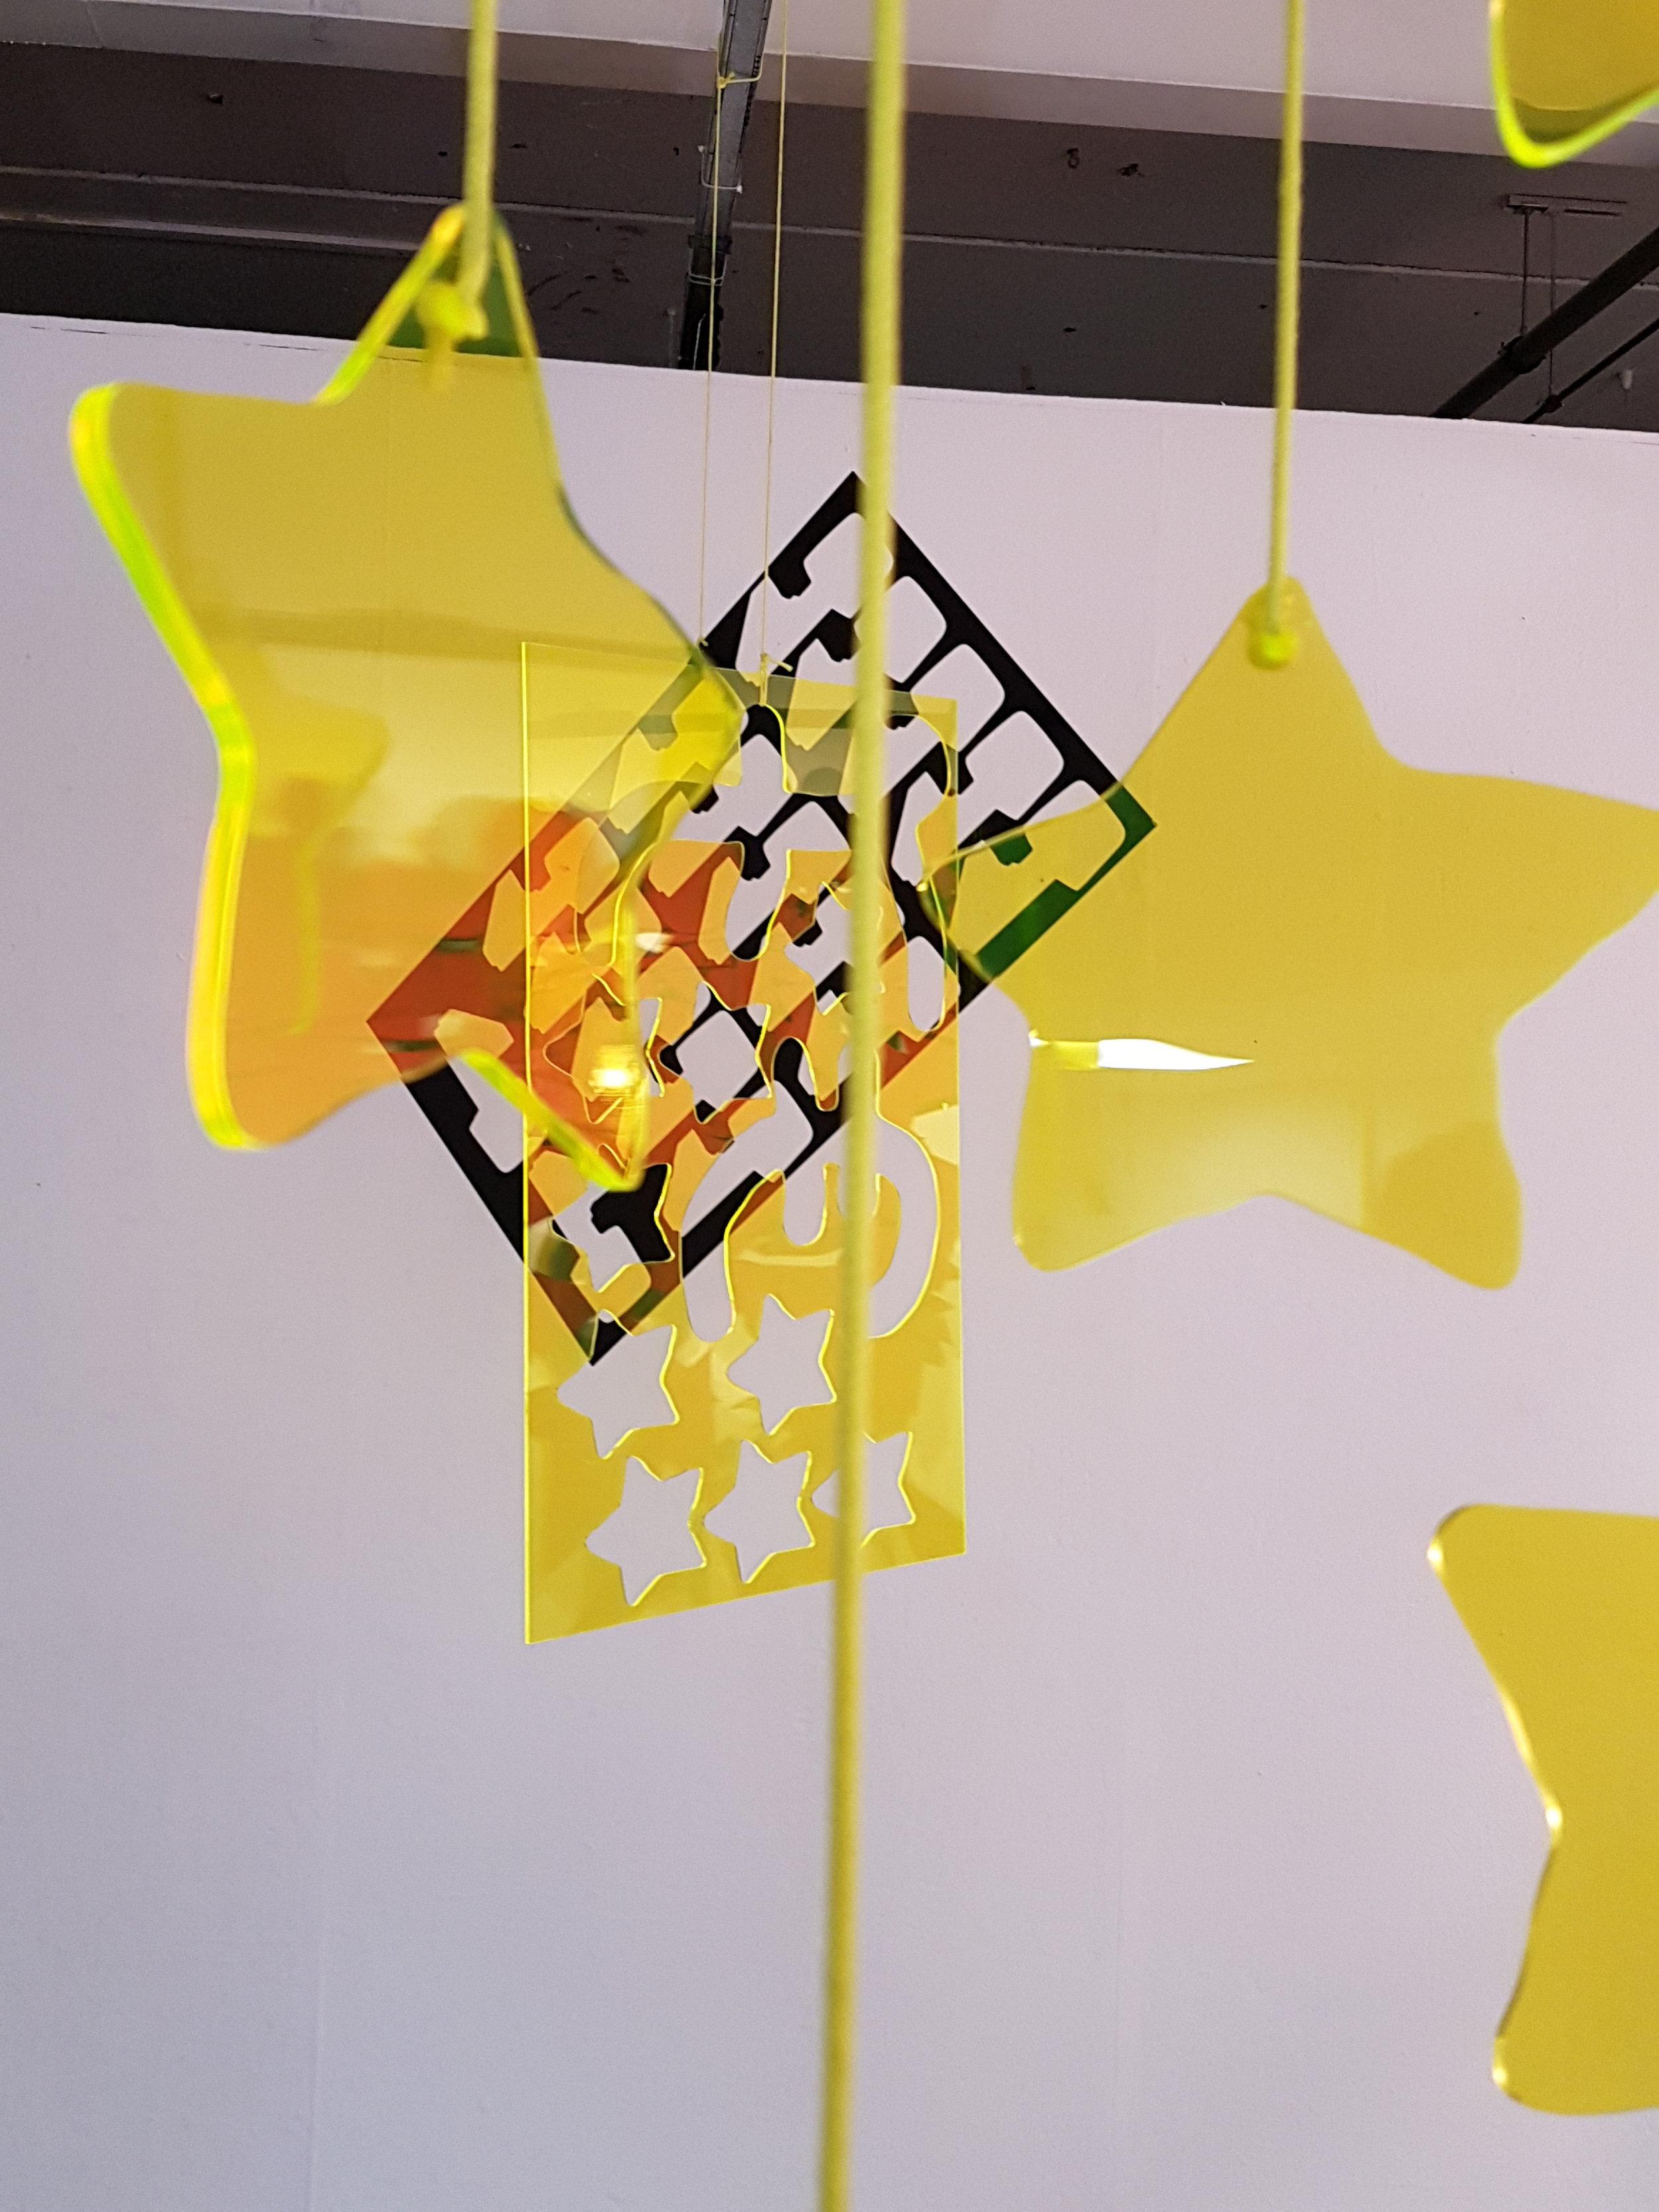 harmony+eu+stars+micro+art+farah+ishaq.jpg